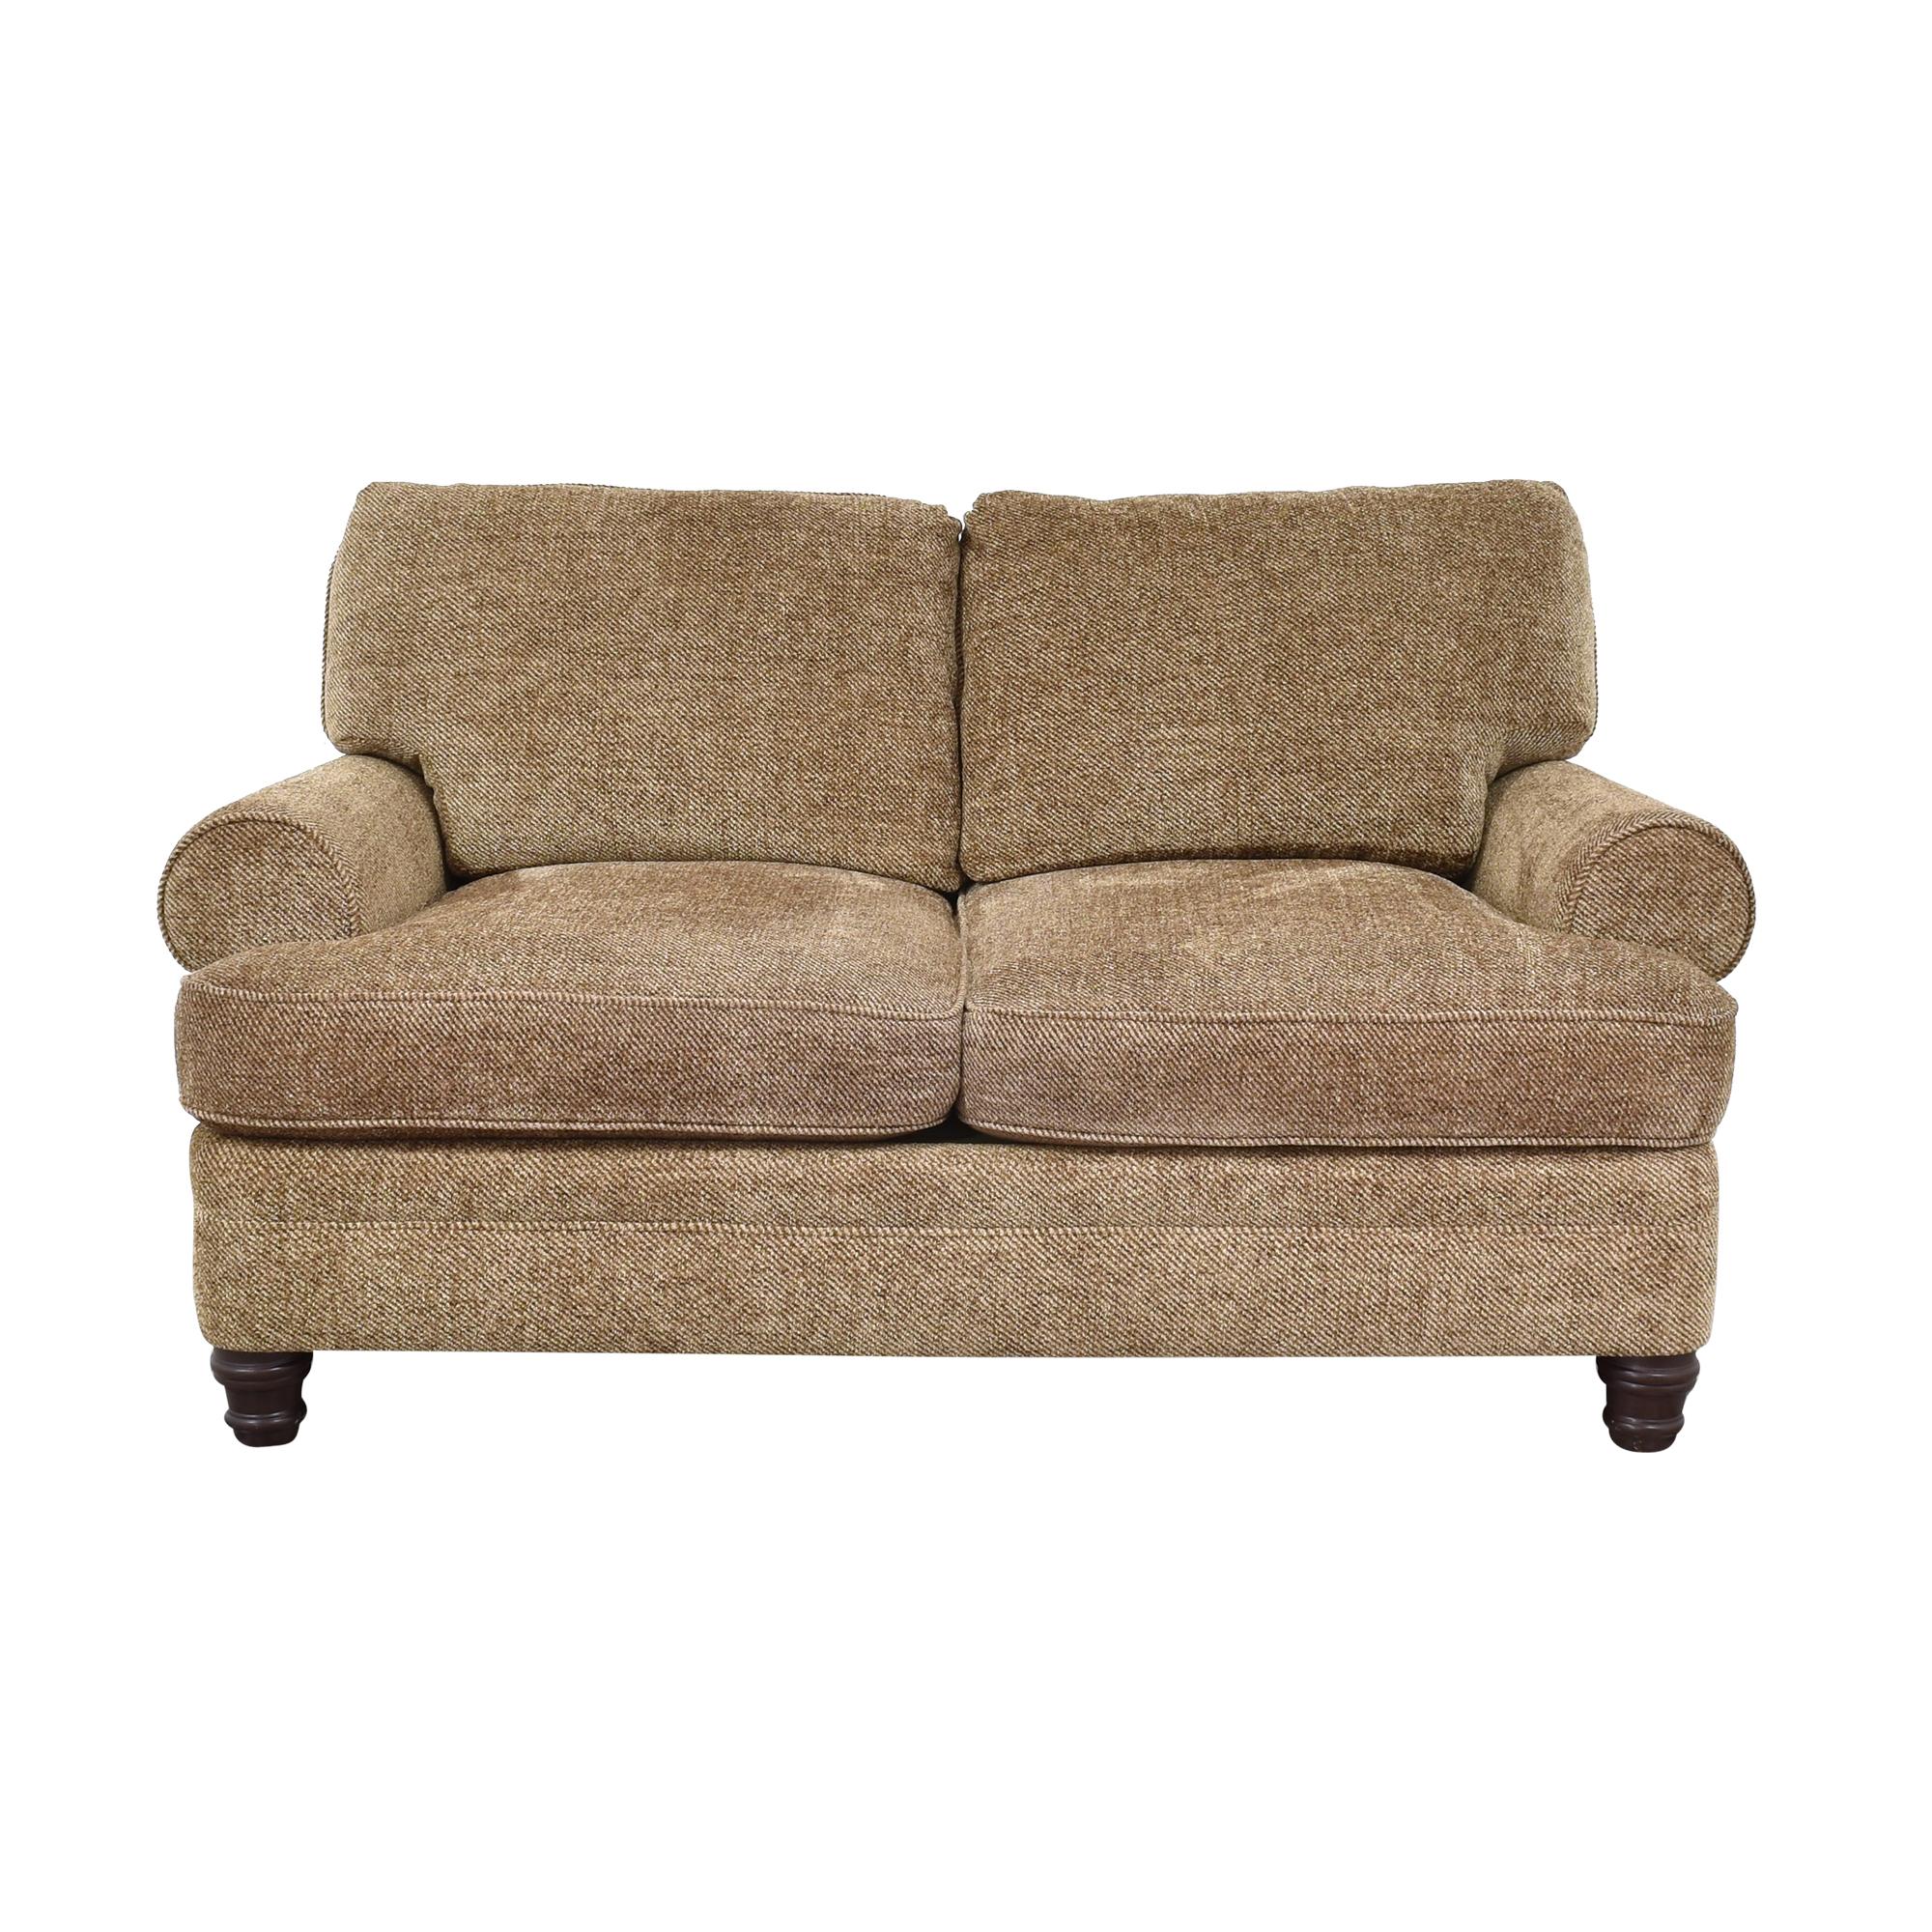 Bernhardt Bernhardt Two Cushion Sofa for sale